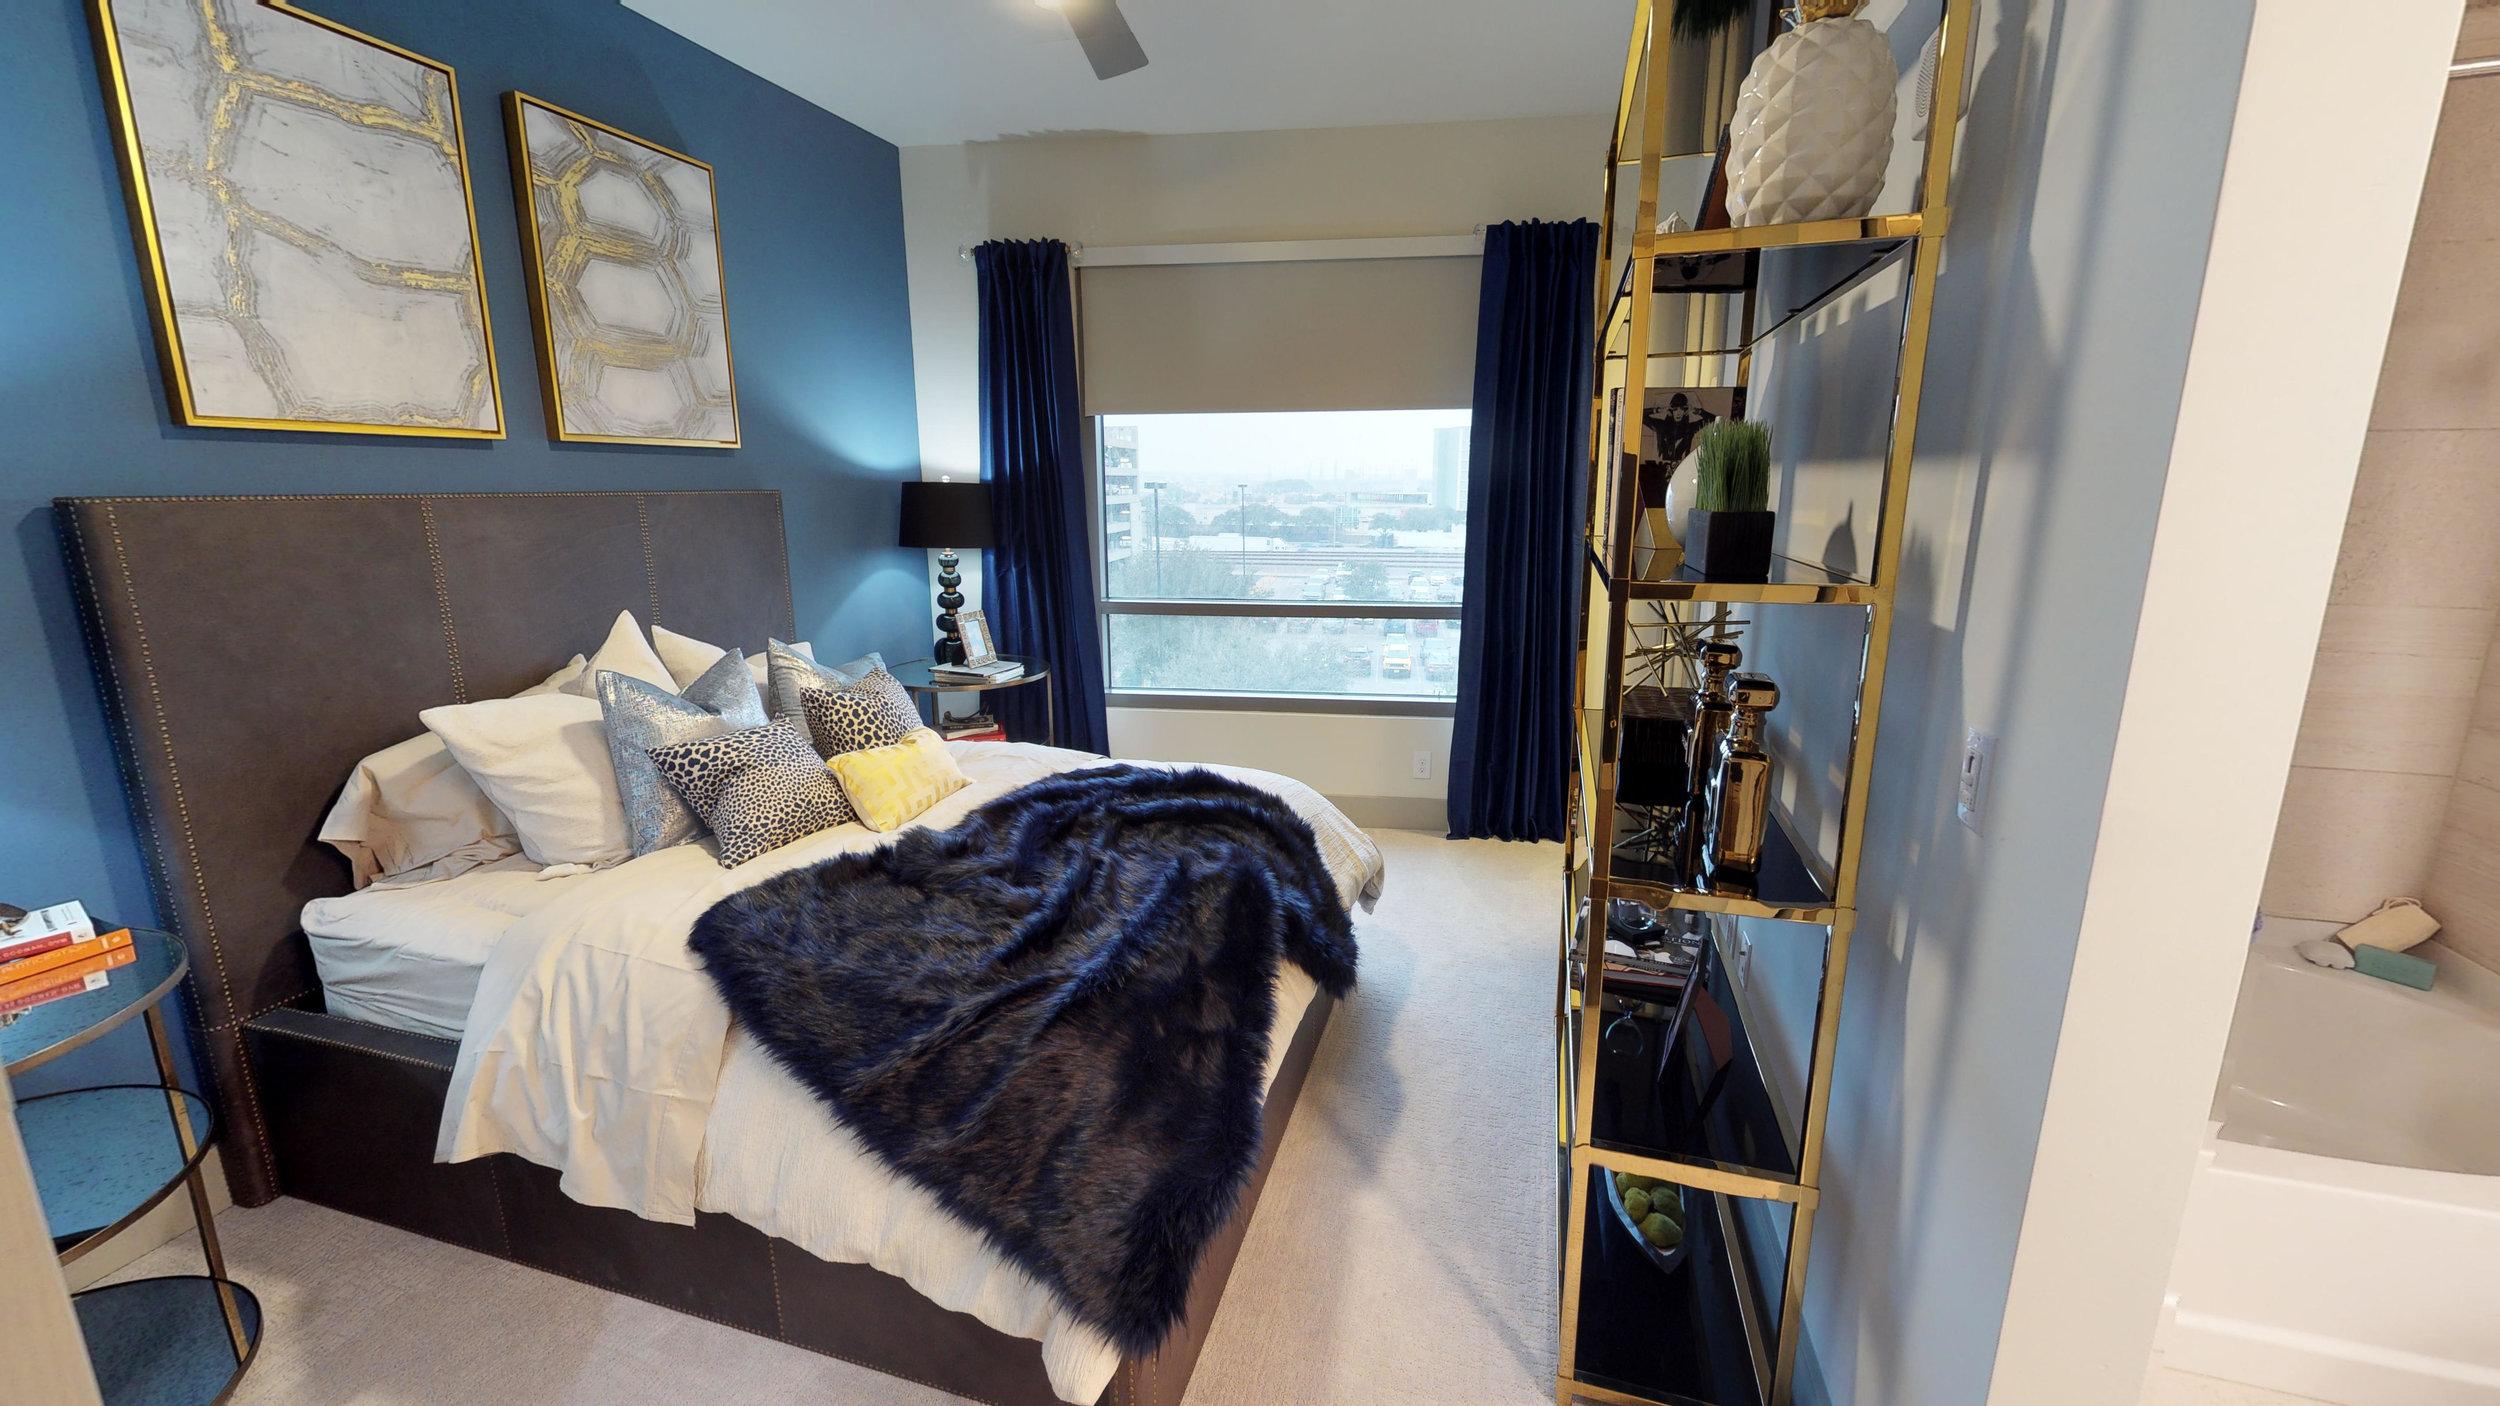 The 23 One Bedroom Model Home (9) (1).jpg